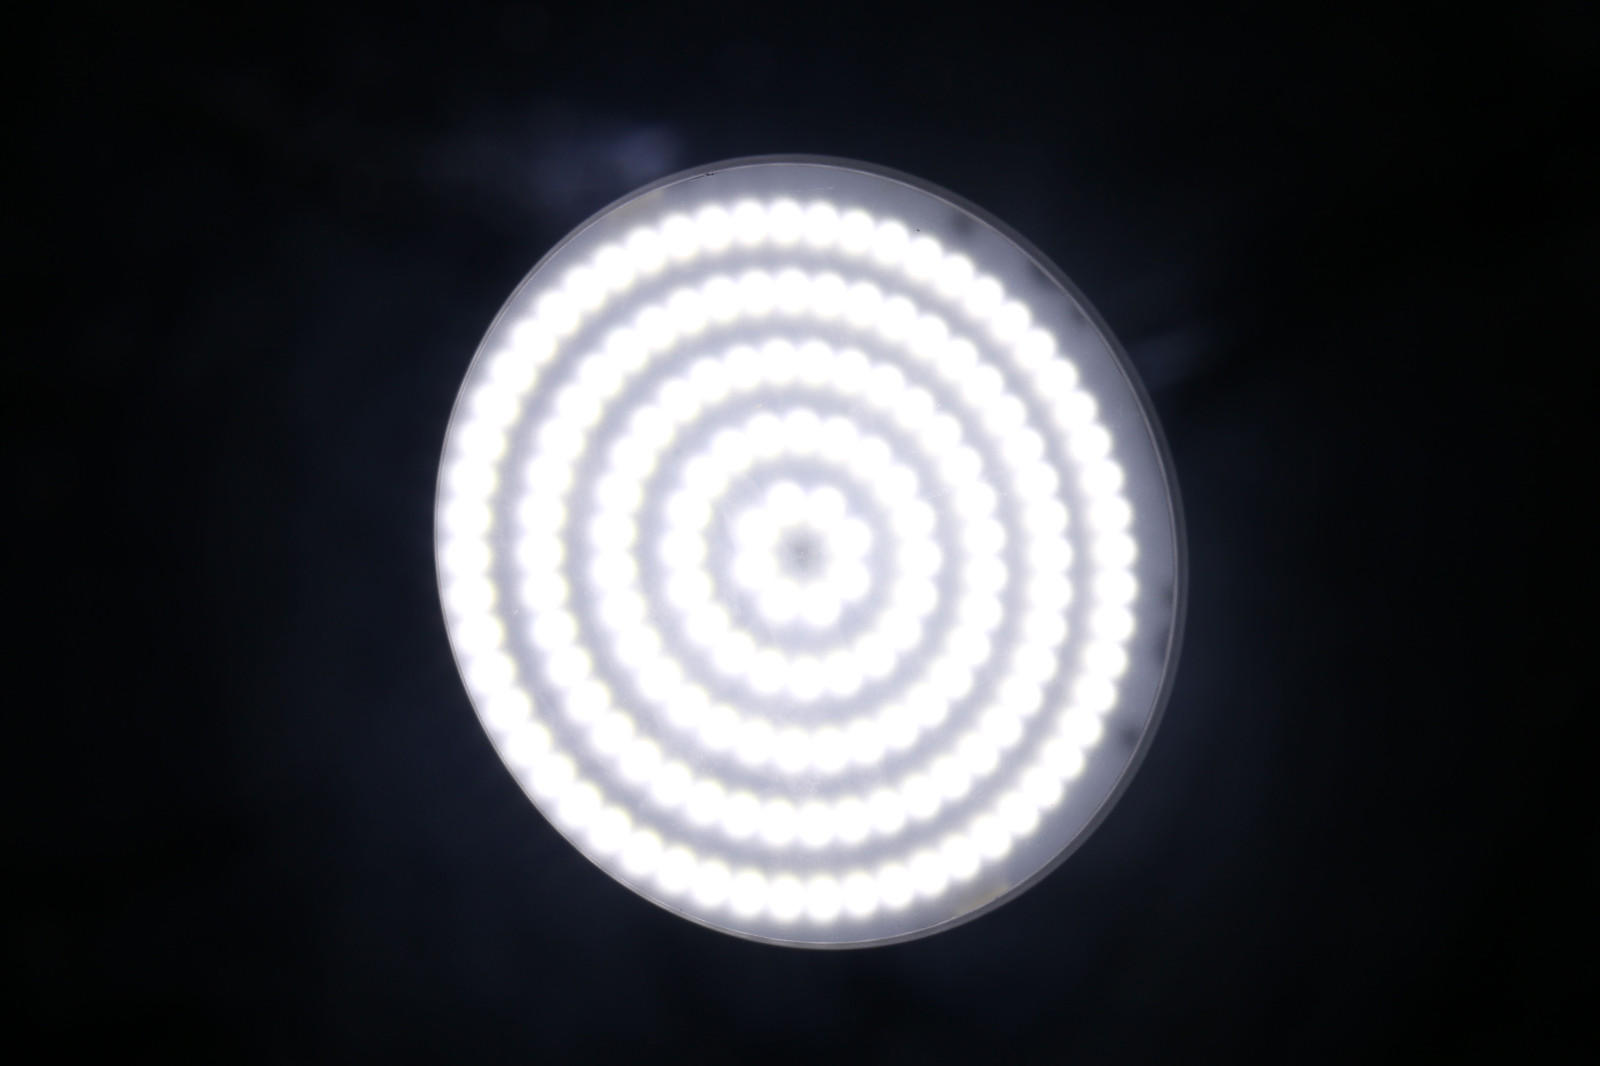 Win-Win disco laser lights lights manufacturer fro night bar